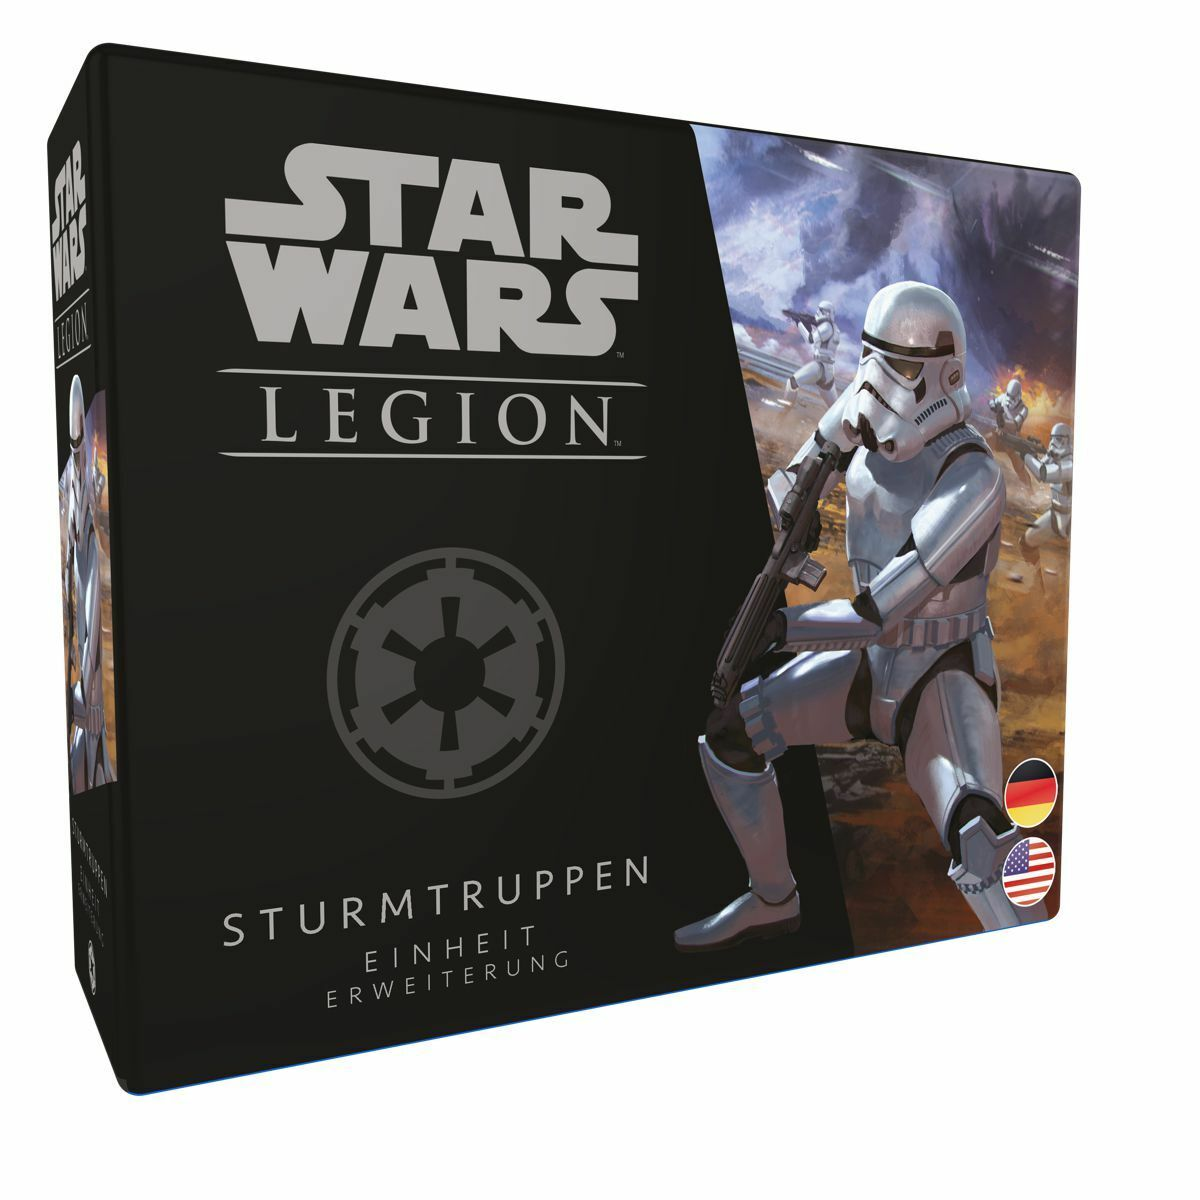 Star Wars Legion Storm Troopers Extension (German   English) Imp. Storm Trooper